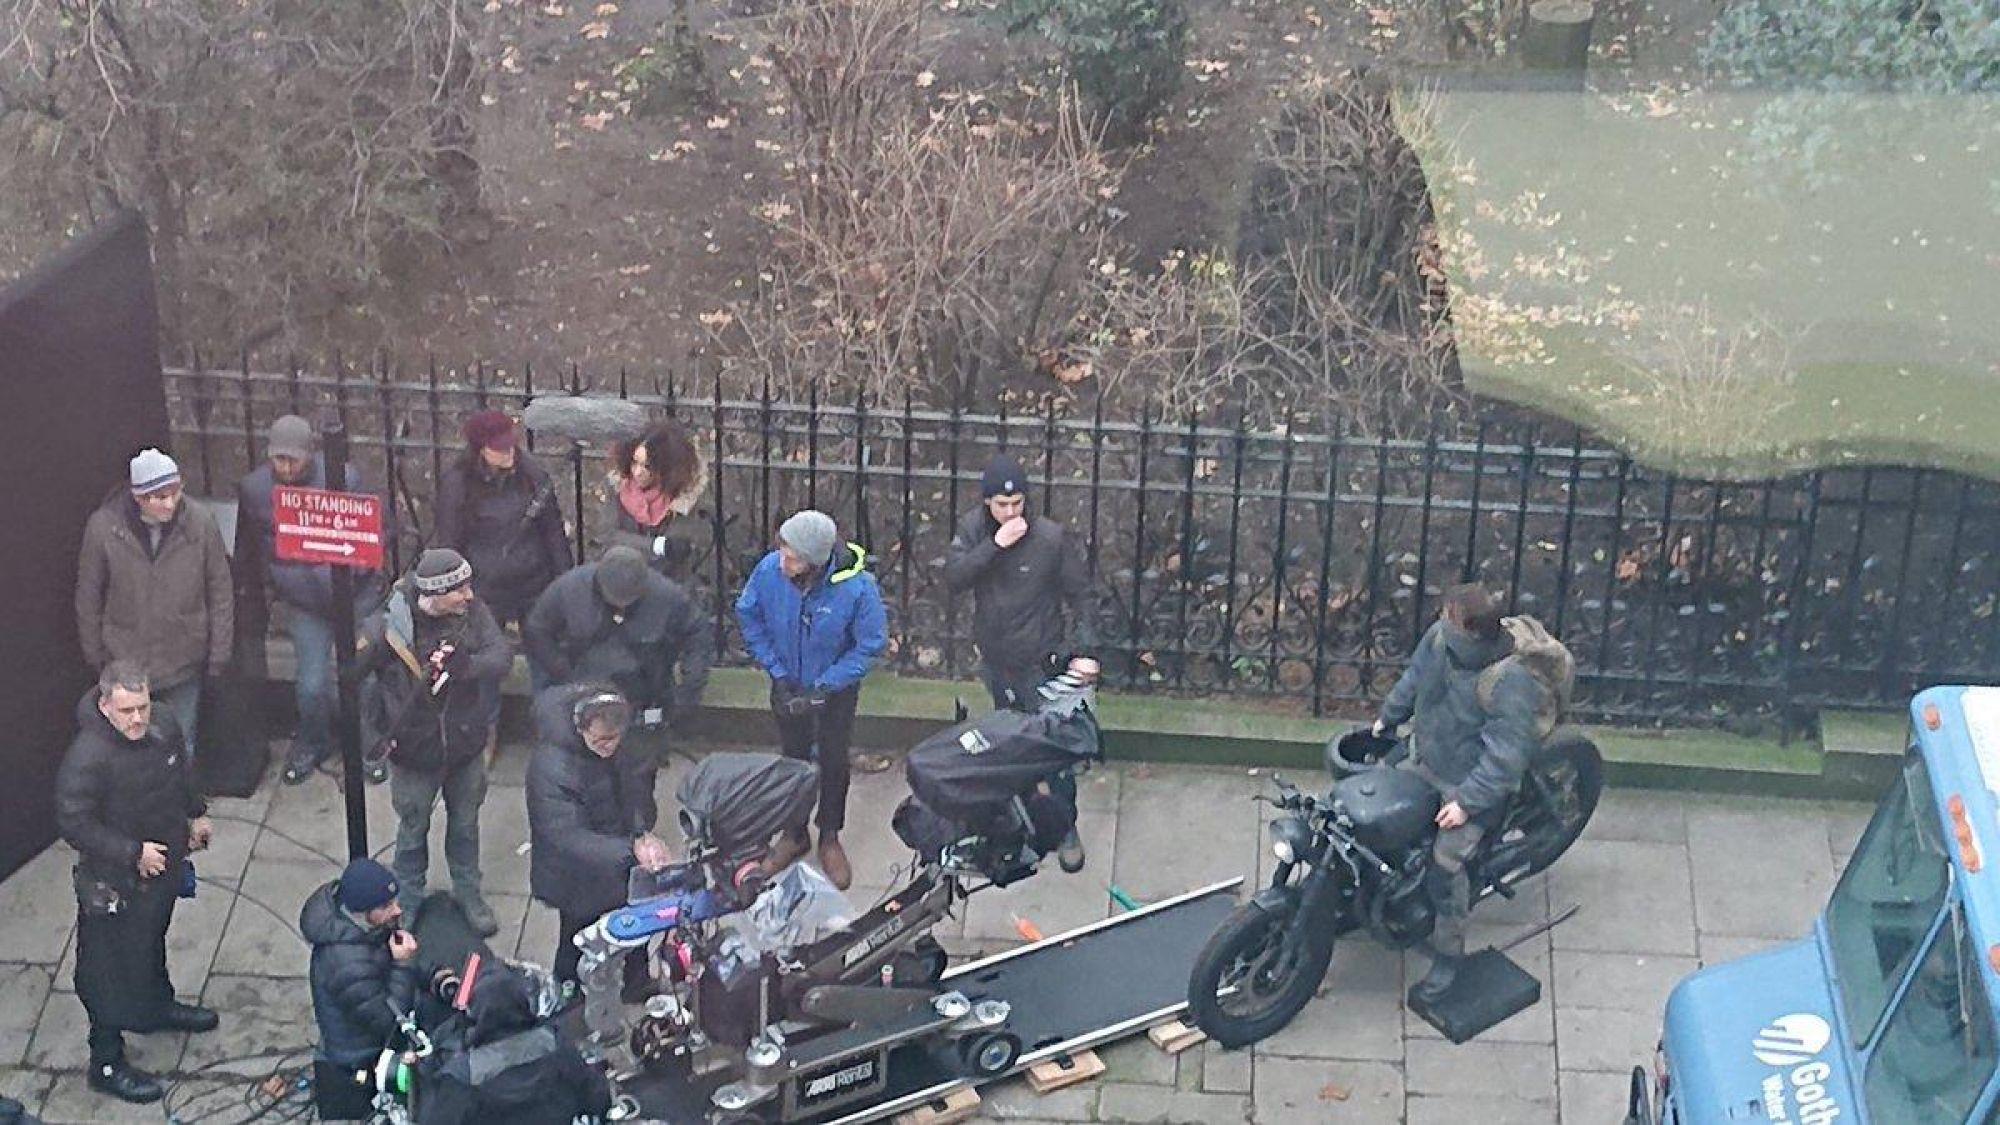 В Лондоне стартовали съёмки «Бэтмена» с Робертом Паттинсоном